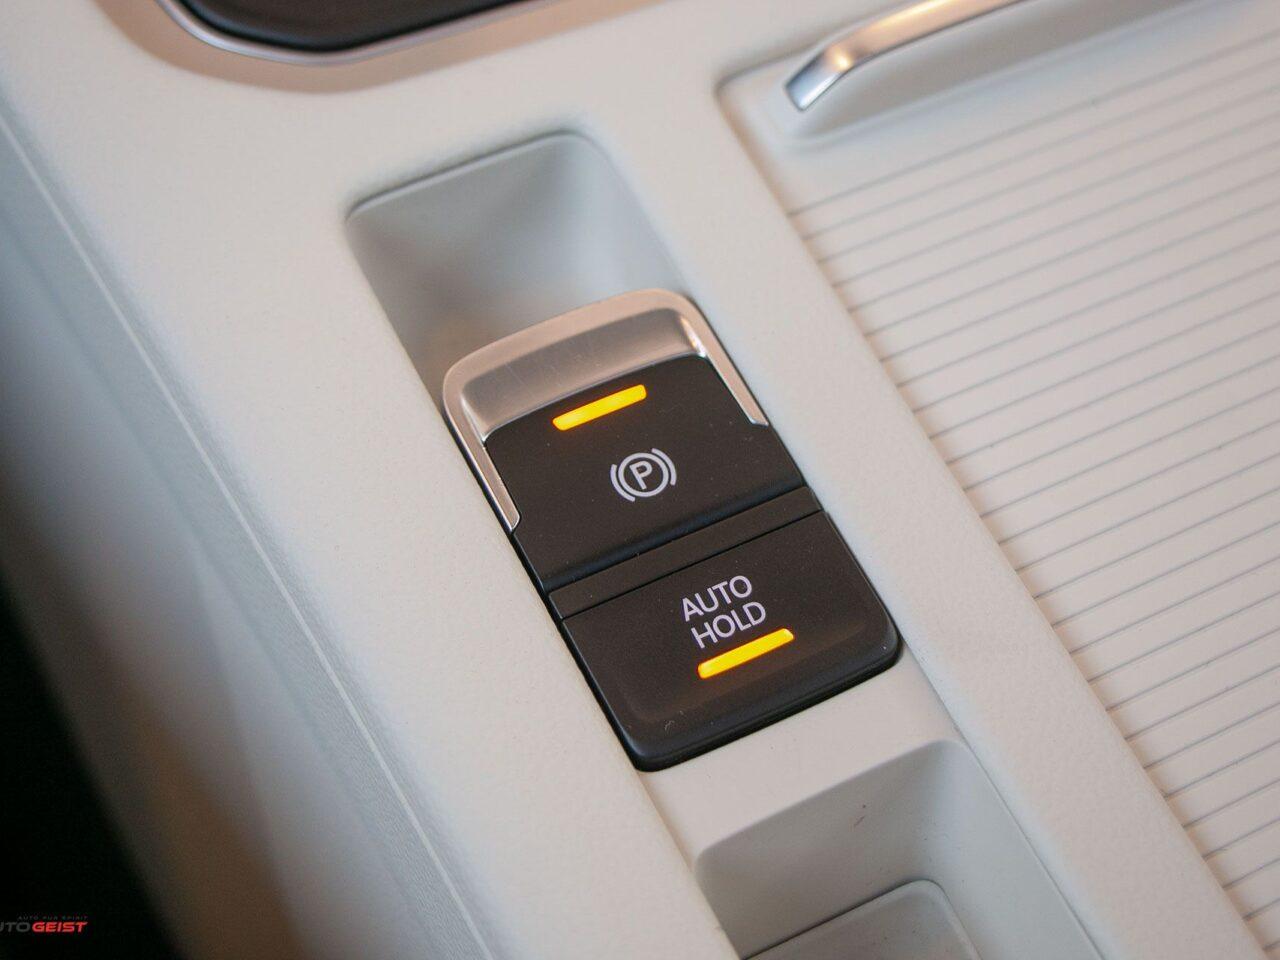 VW-PASSAT-break-panoramic-4513